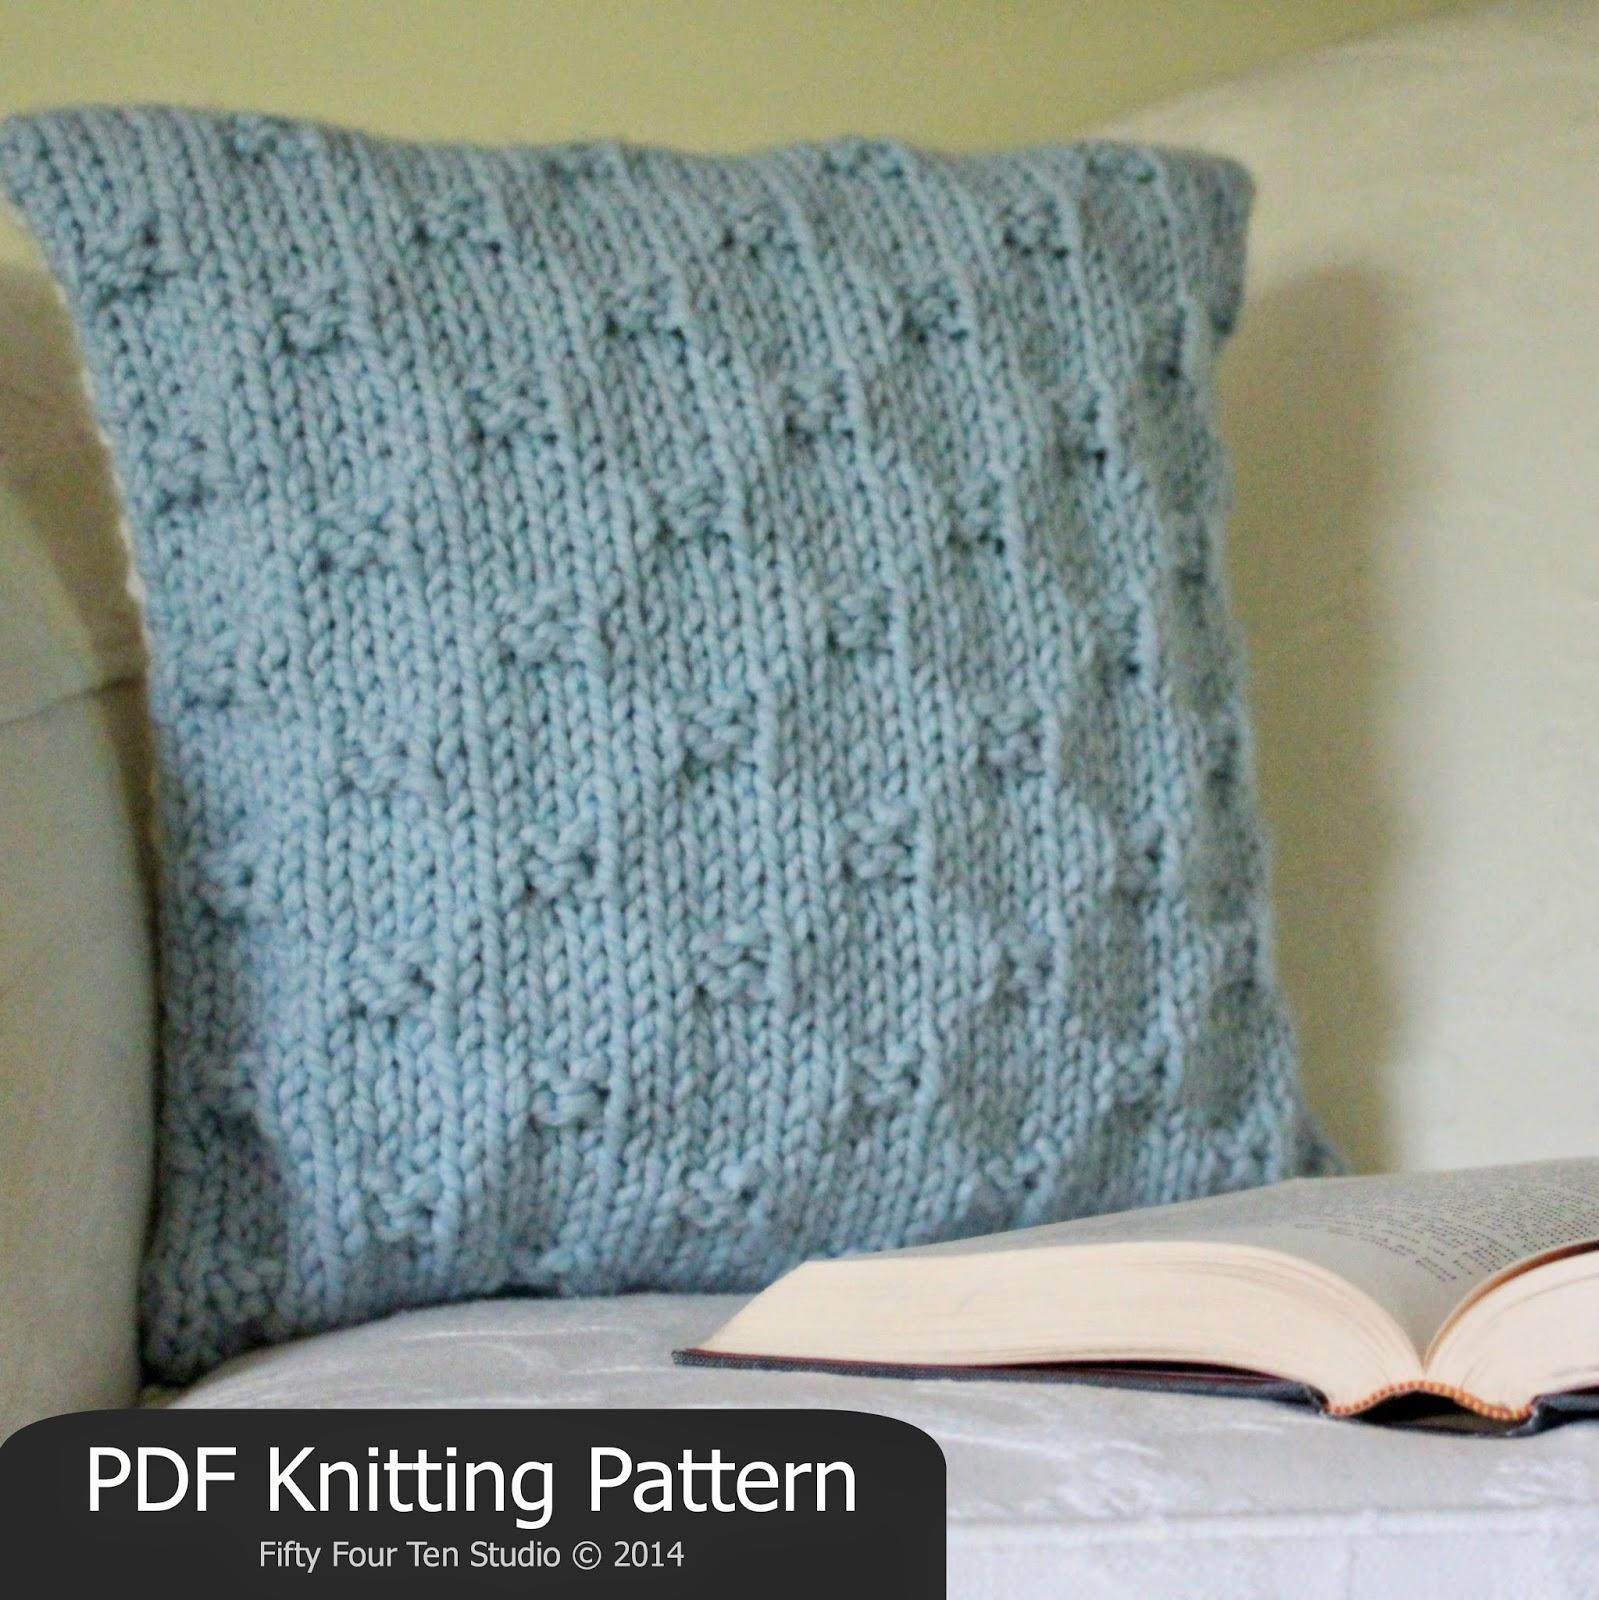 Pillow Knitting Pattern : Fifty Four Ten Studio: The Perfect Present Pillow   New Knitting Pattern